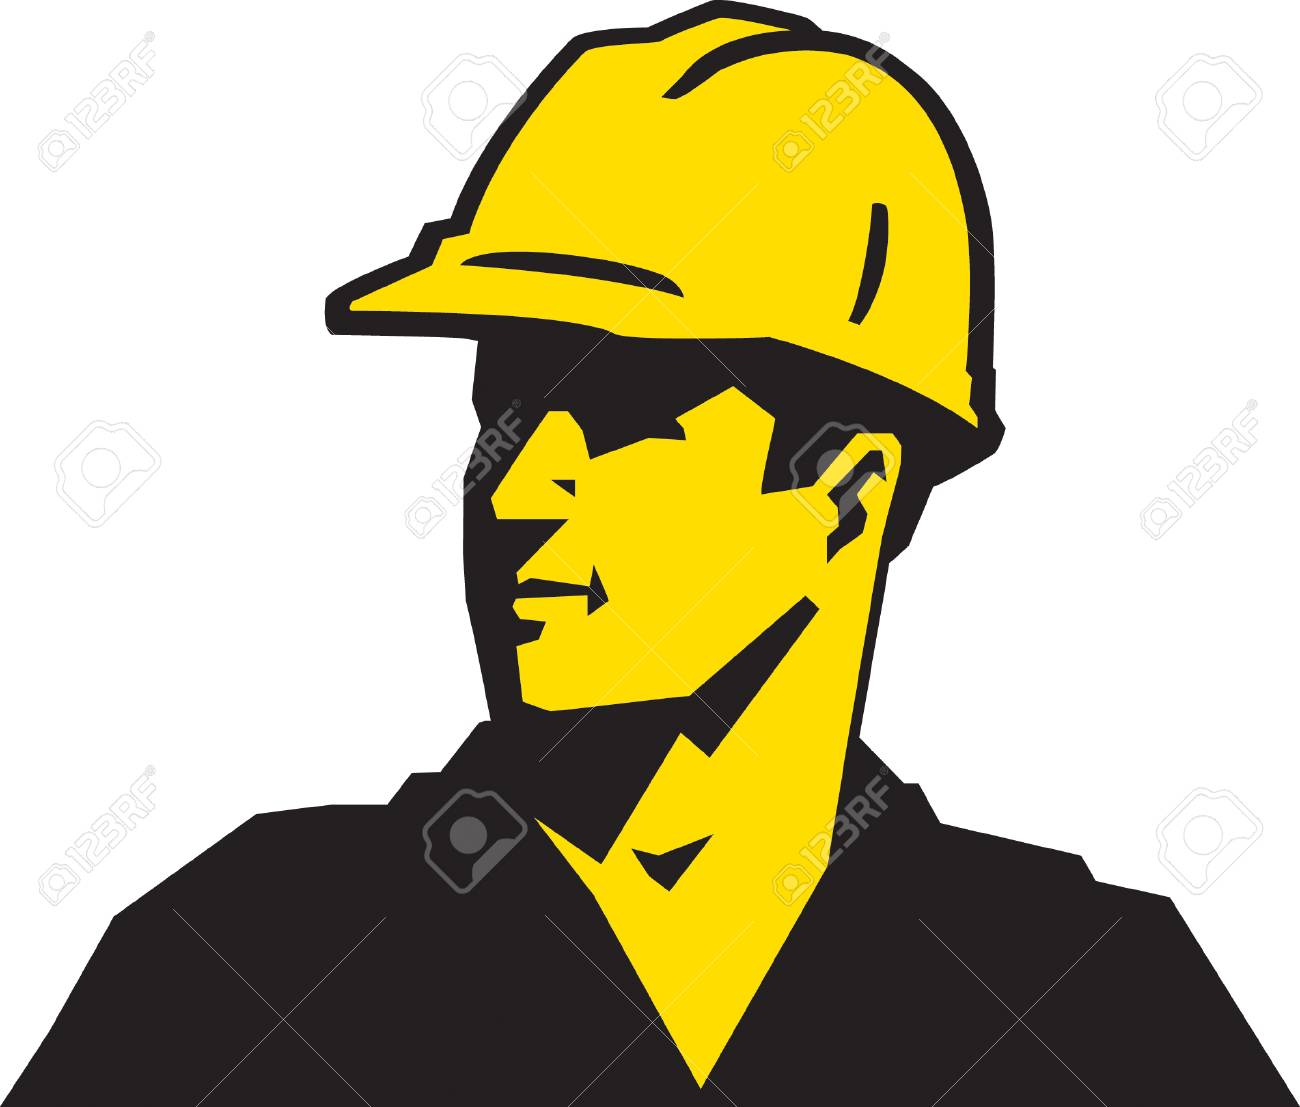 Construction Guy Stock Vector - 24305985